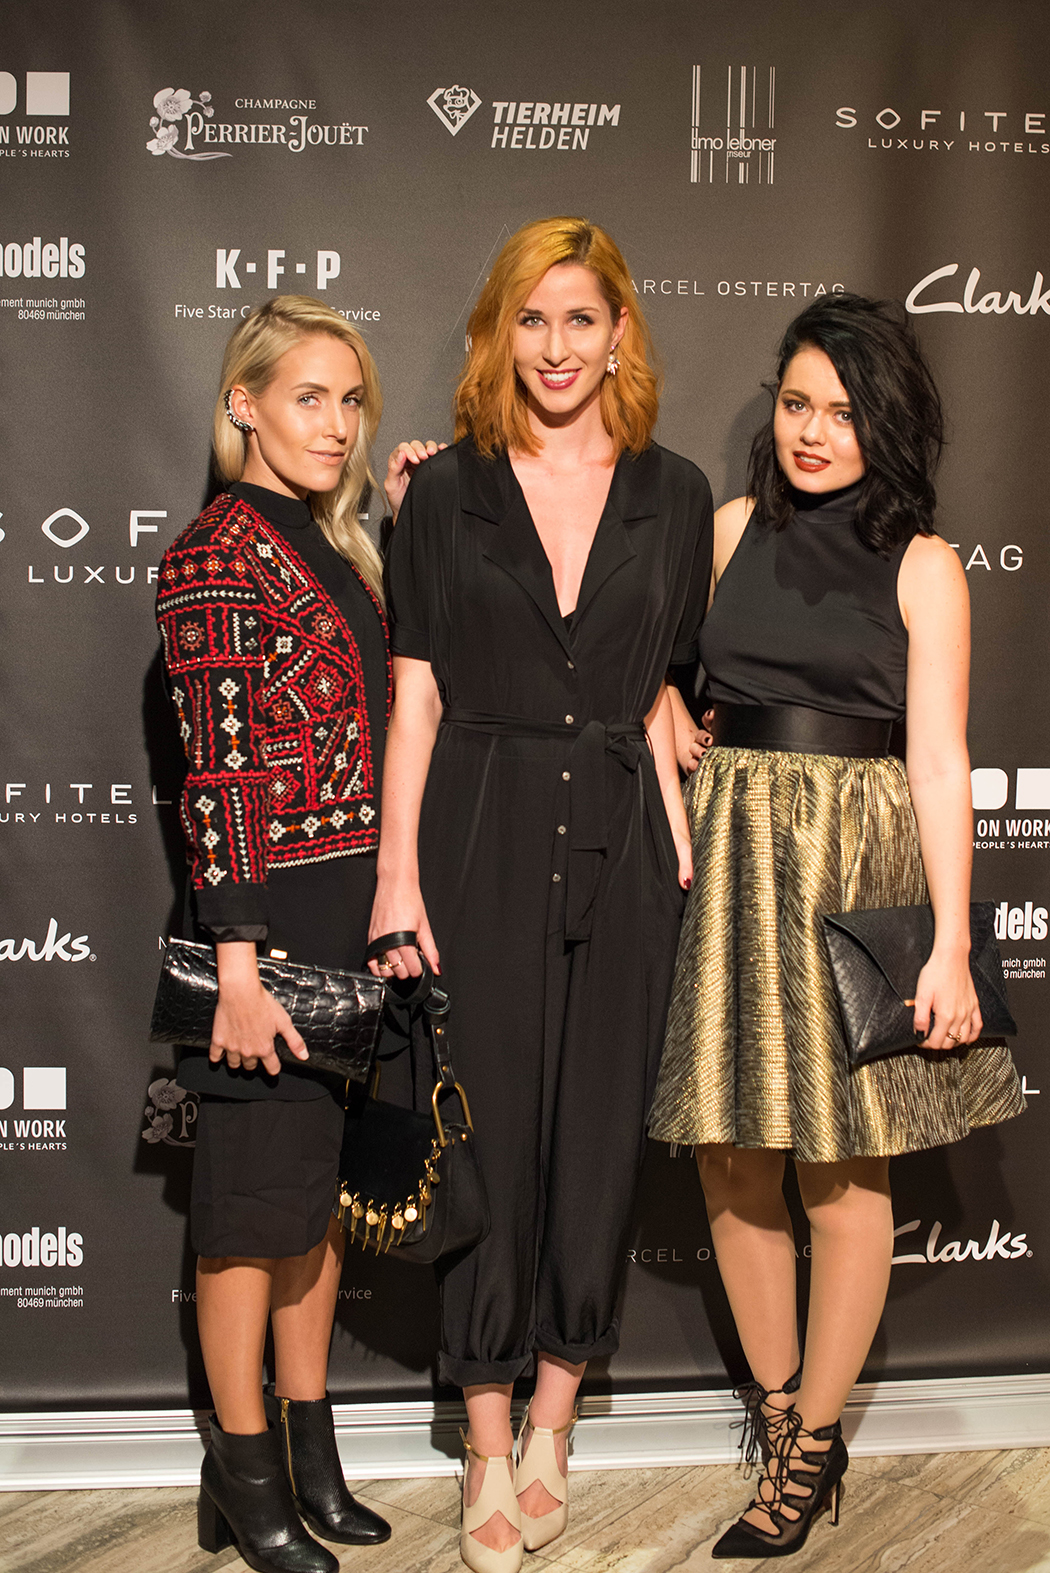 Fashionblog-Fashionblogger-Fashion-Blog-Blogger-Lifestyle-Lindarella-Marcel-Ostertag-Fashionshow-2-web